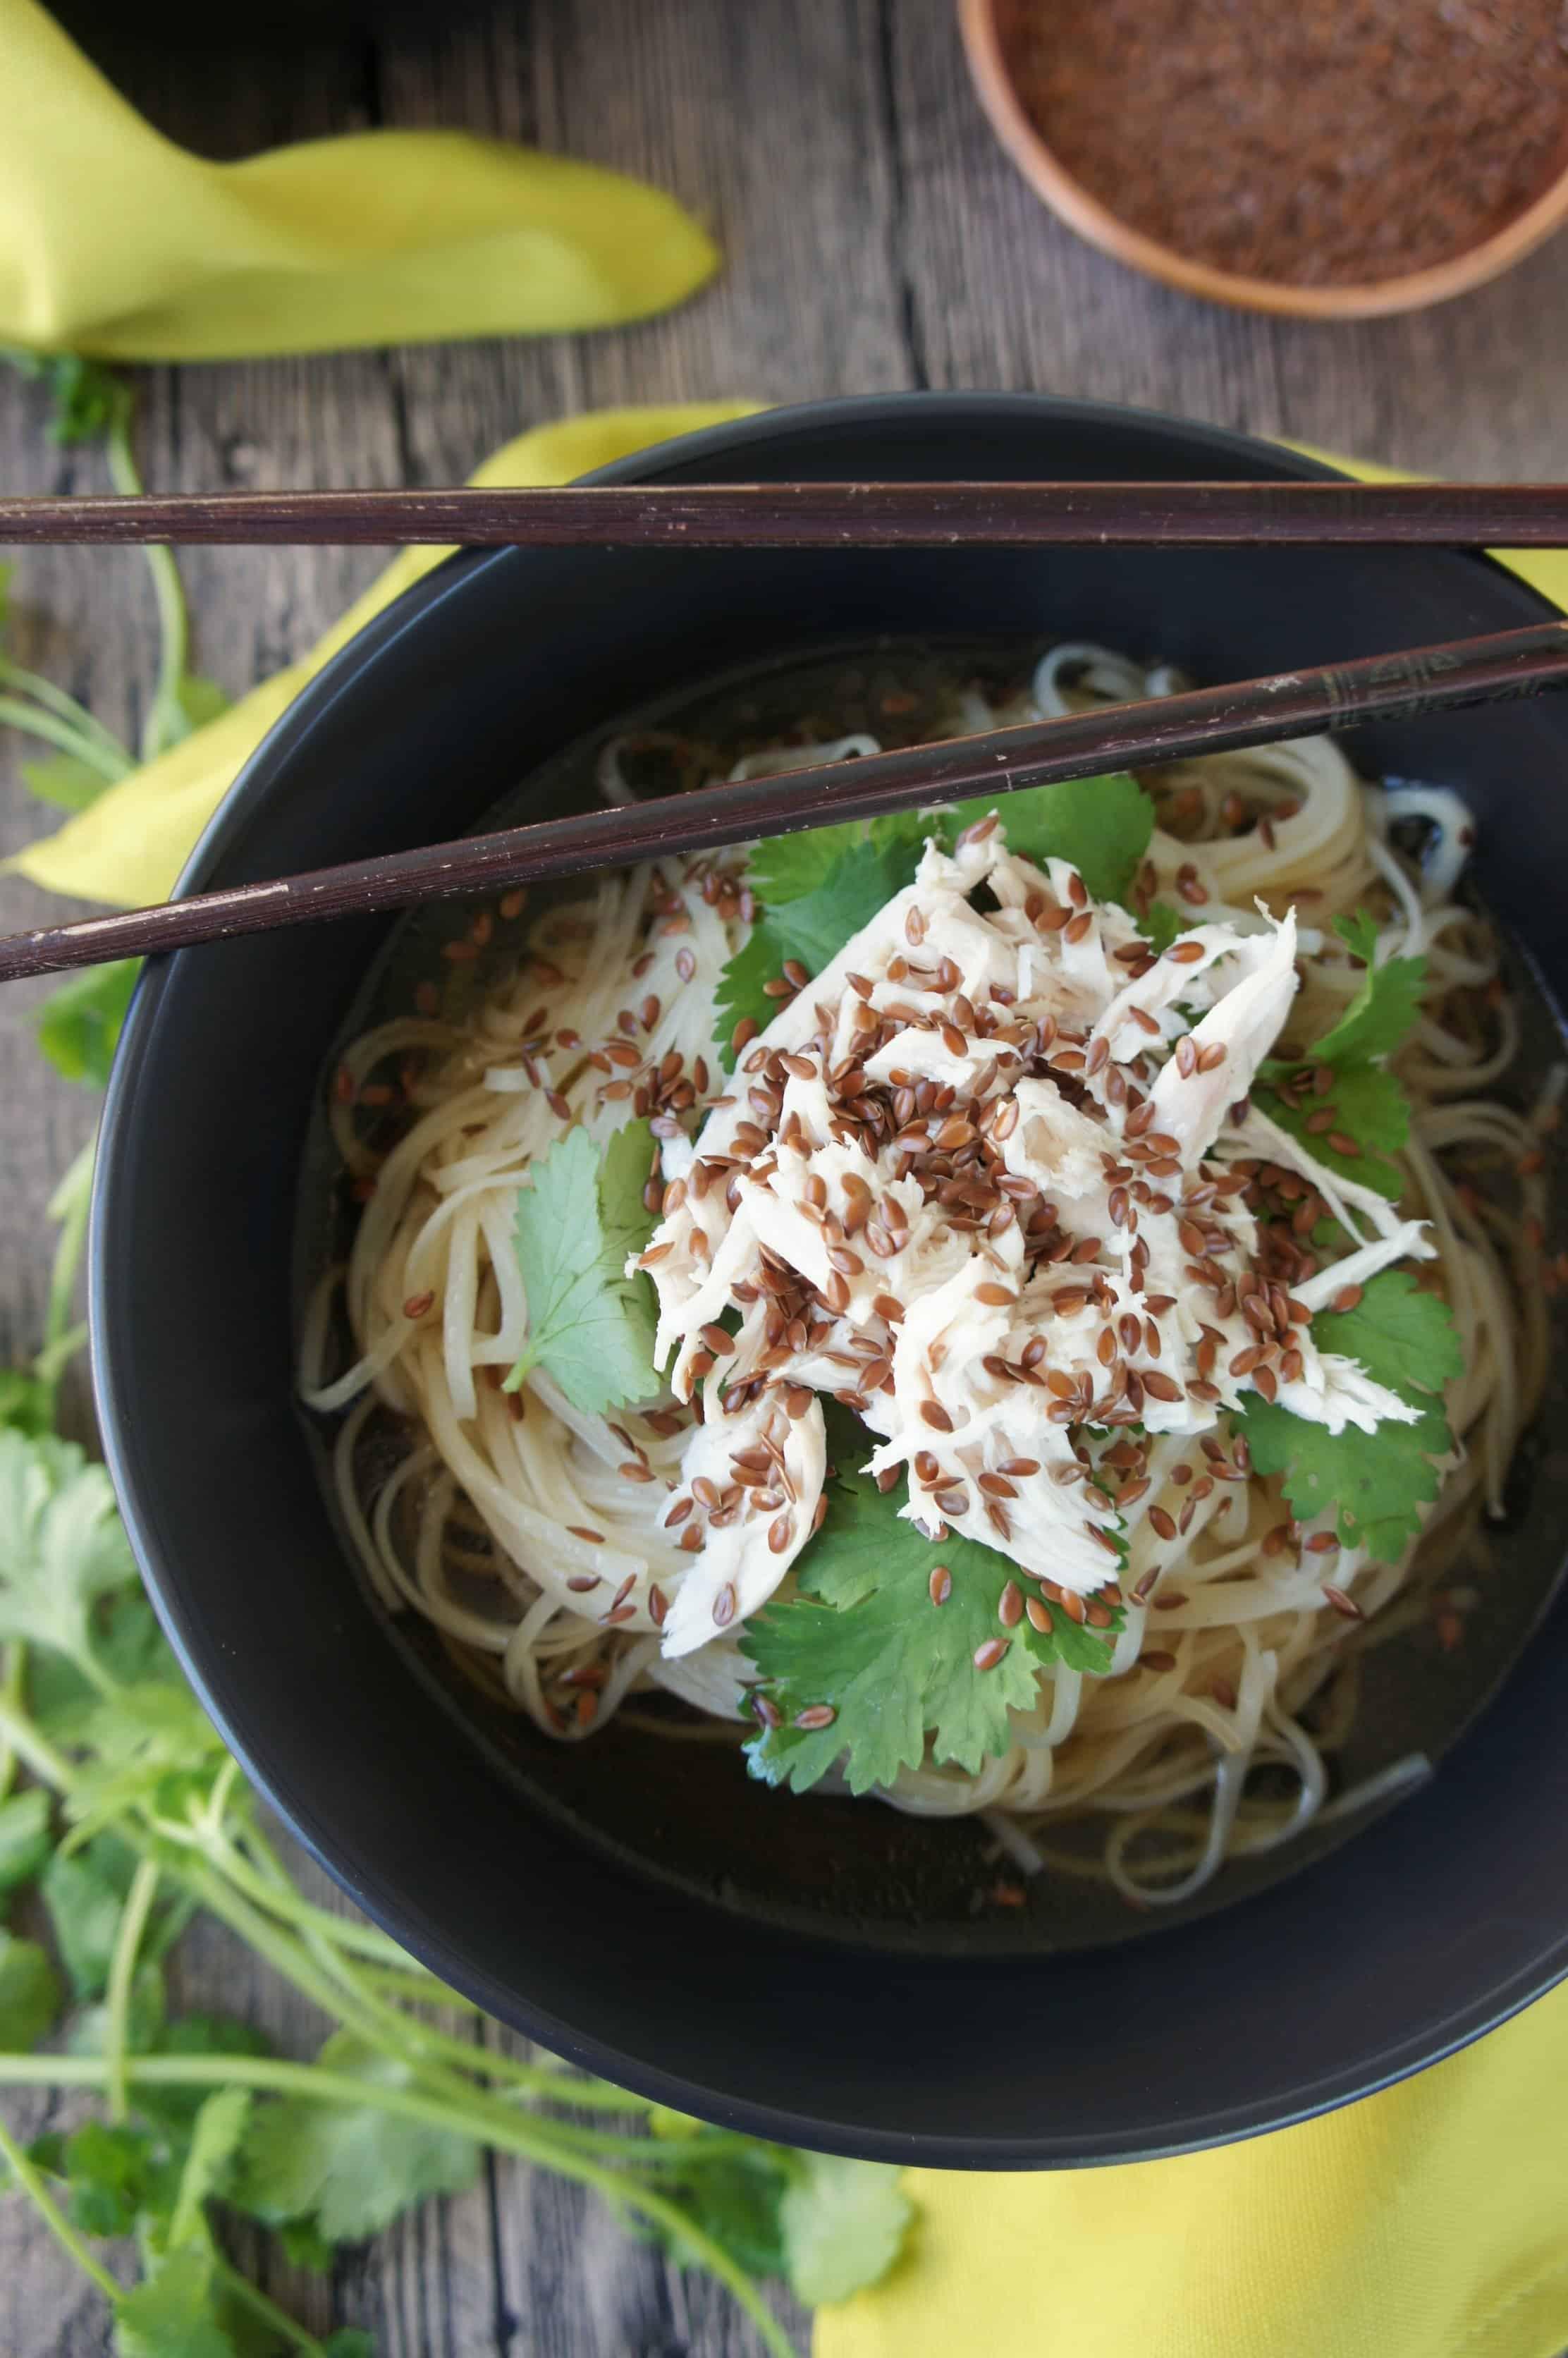 Sweet Caramel Sunday - Chicken Noodle Bowl